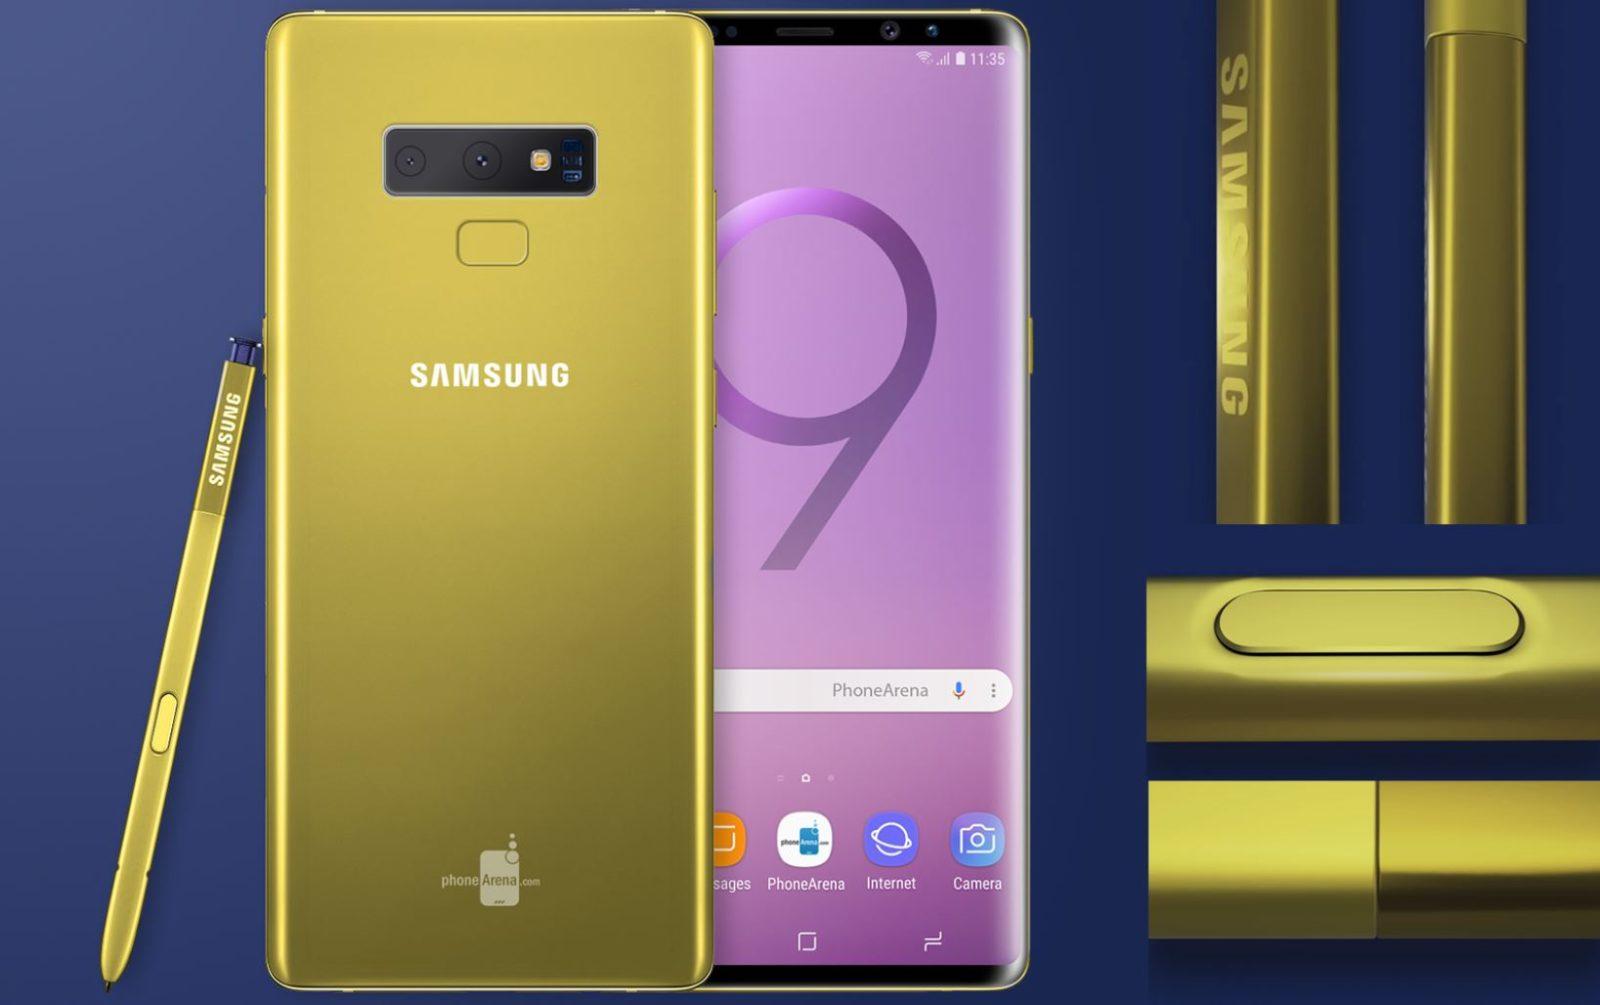 Samsung-Galaxy-Note-9-Gold-Concept-Render-PhoneArena-1600x1005.jpg